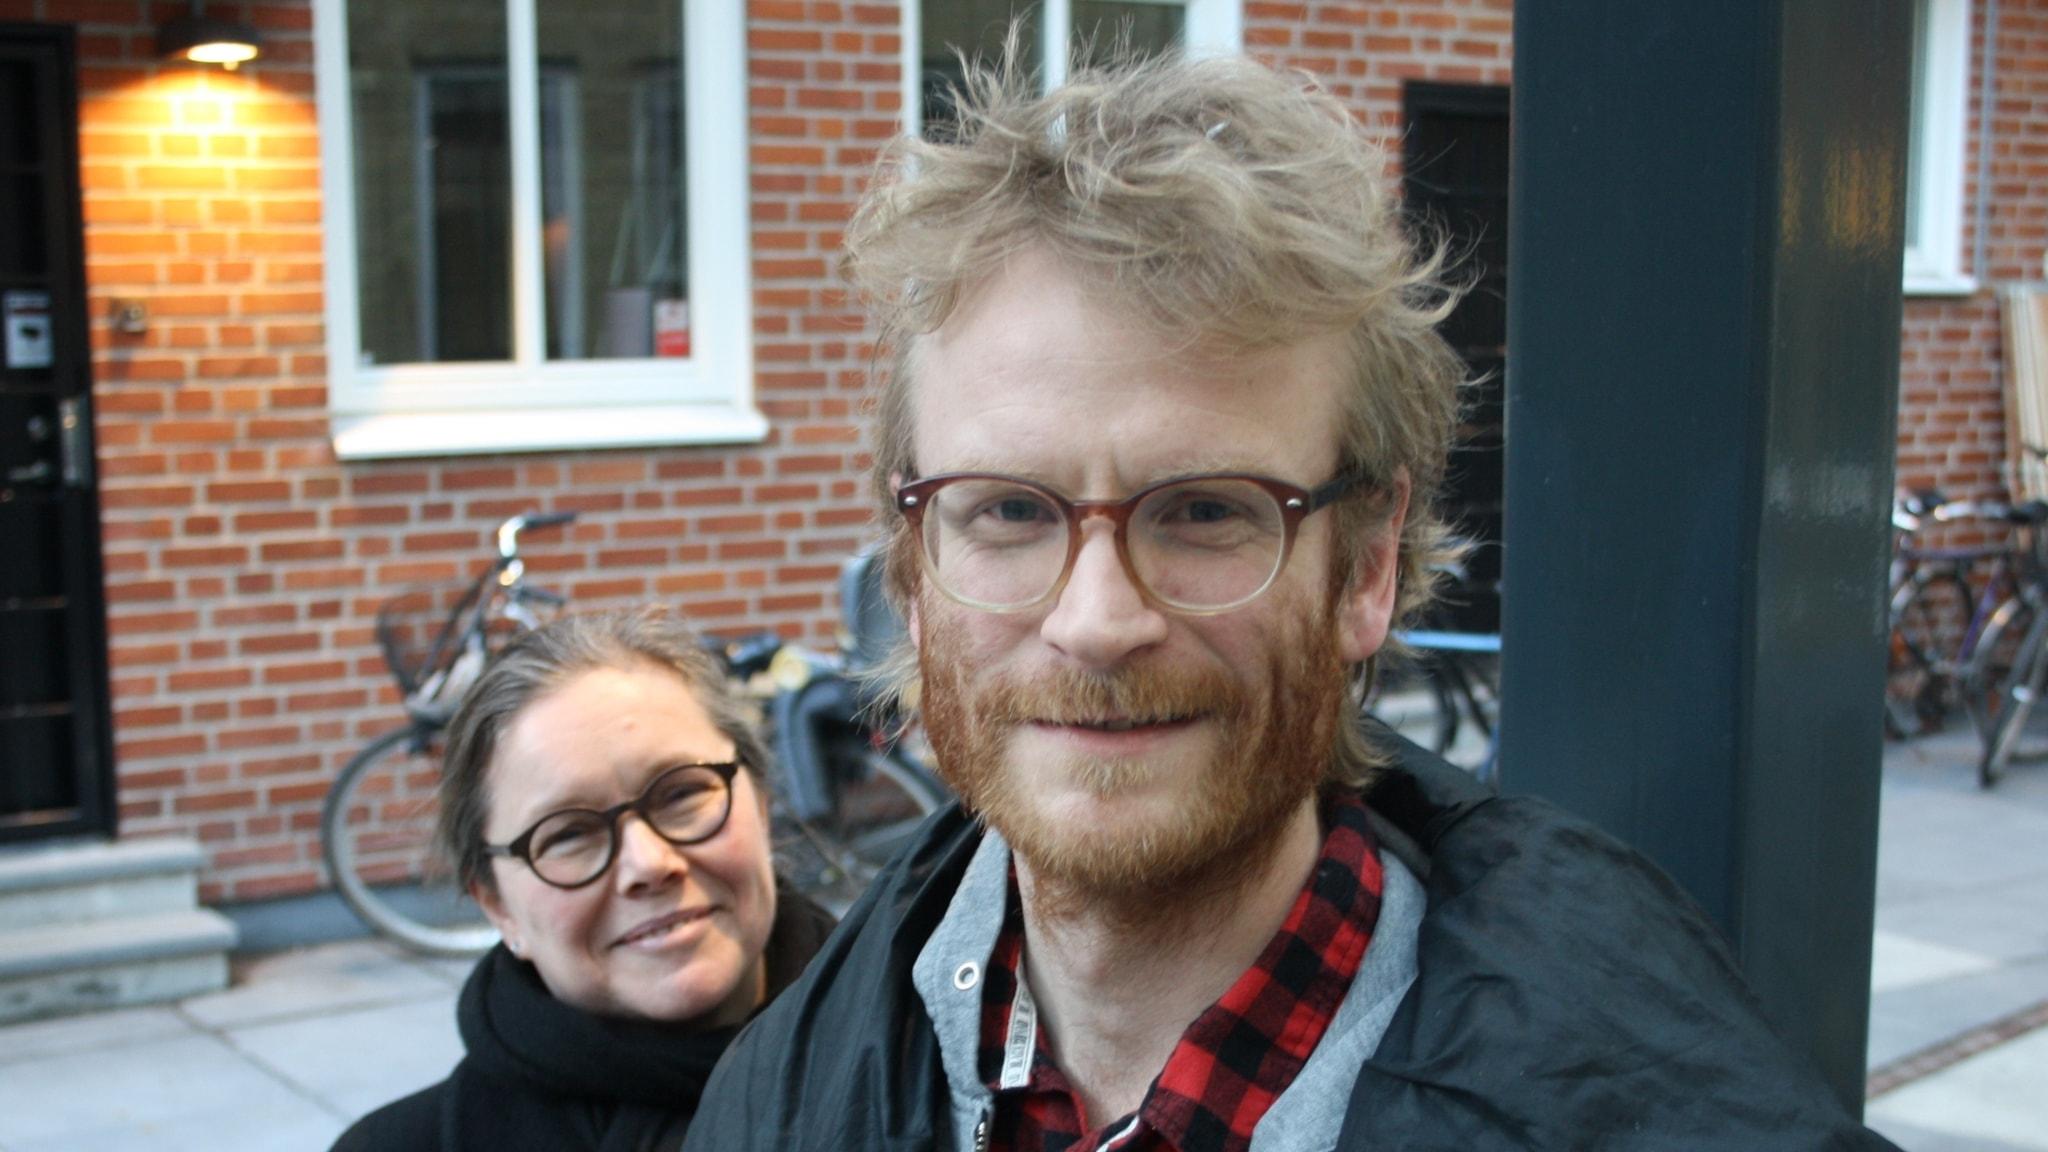 Möt Erik Holmström som driver Malmö dockteater